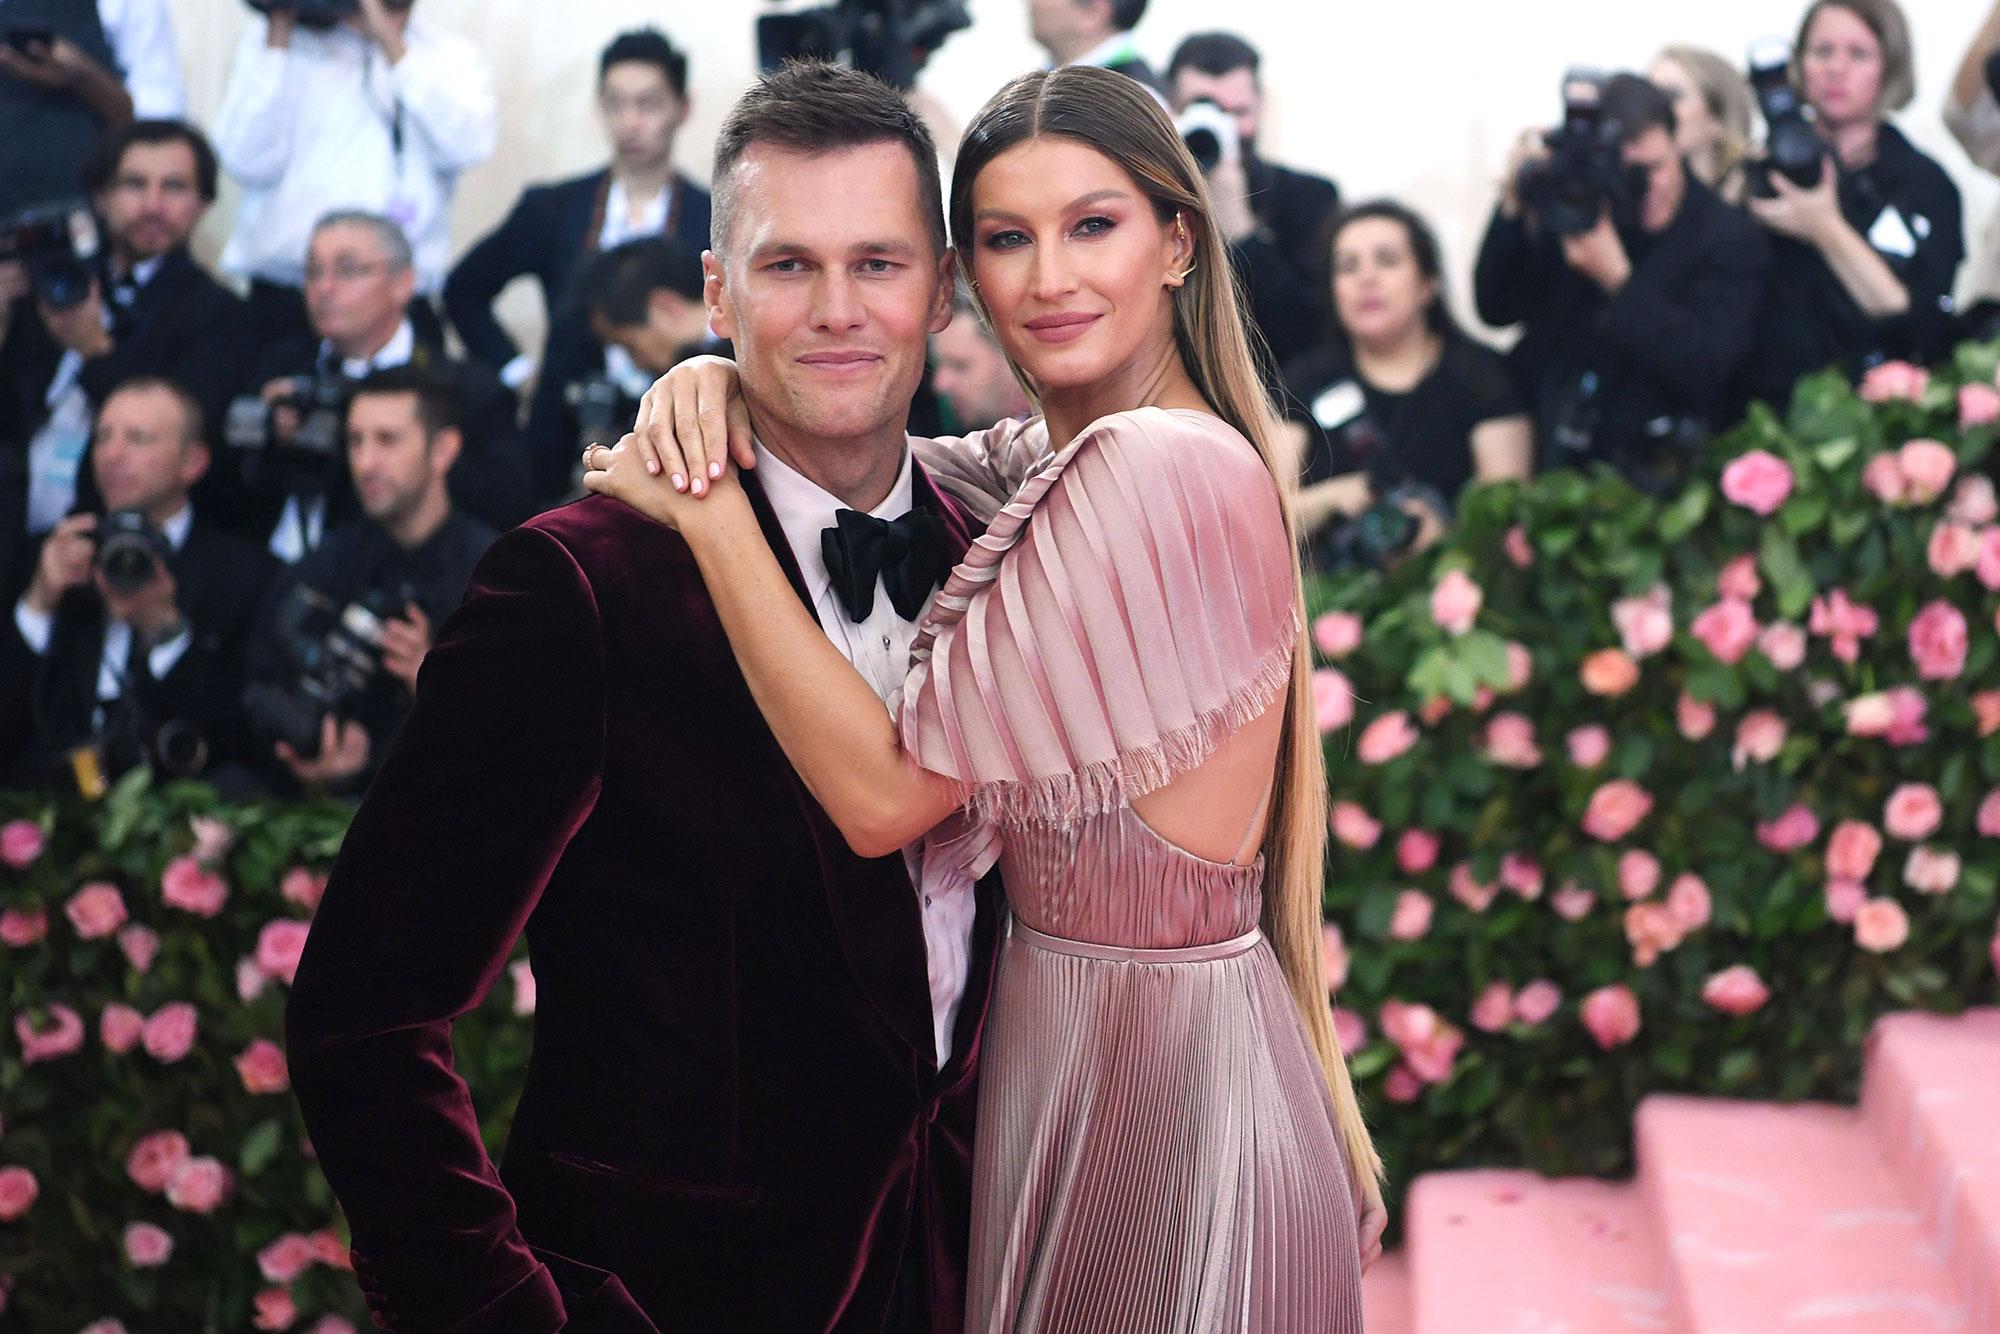 Tom Brady and Gisele Bundchen MET Gala Kicked Out of Florida Park